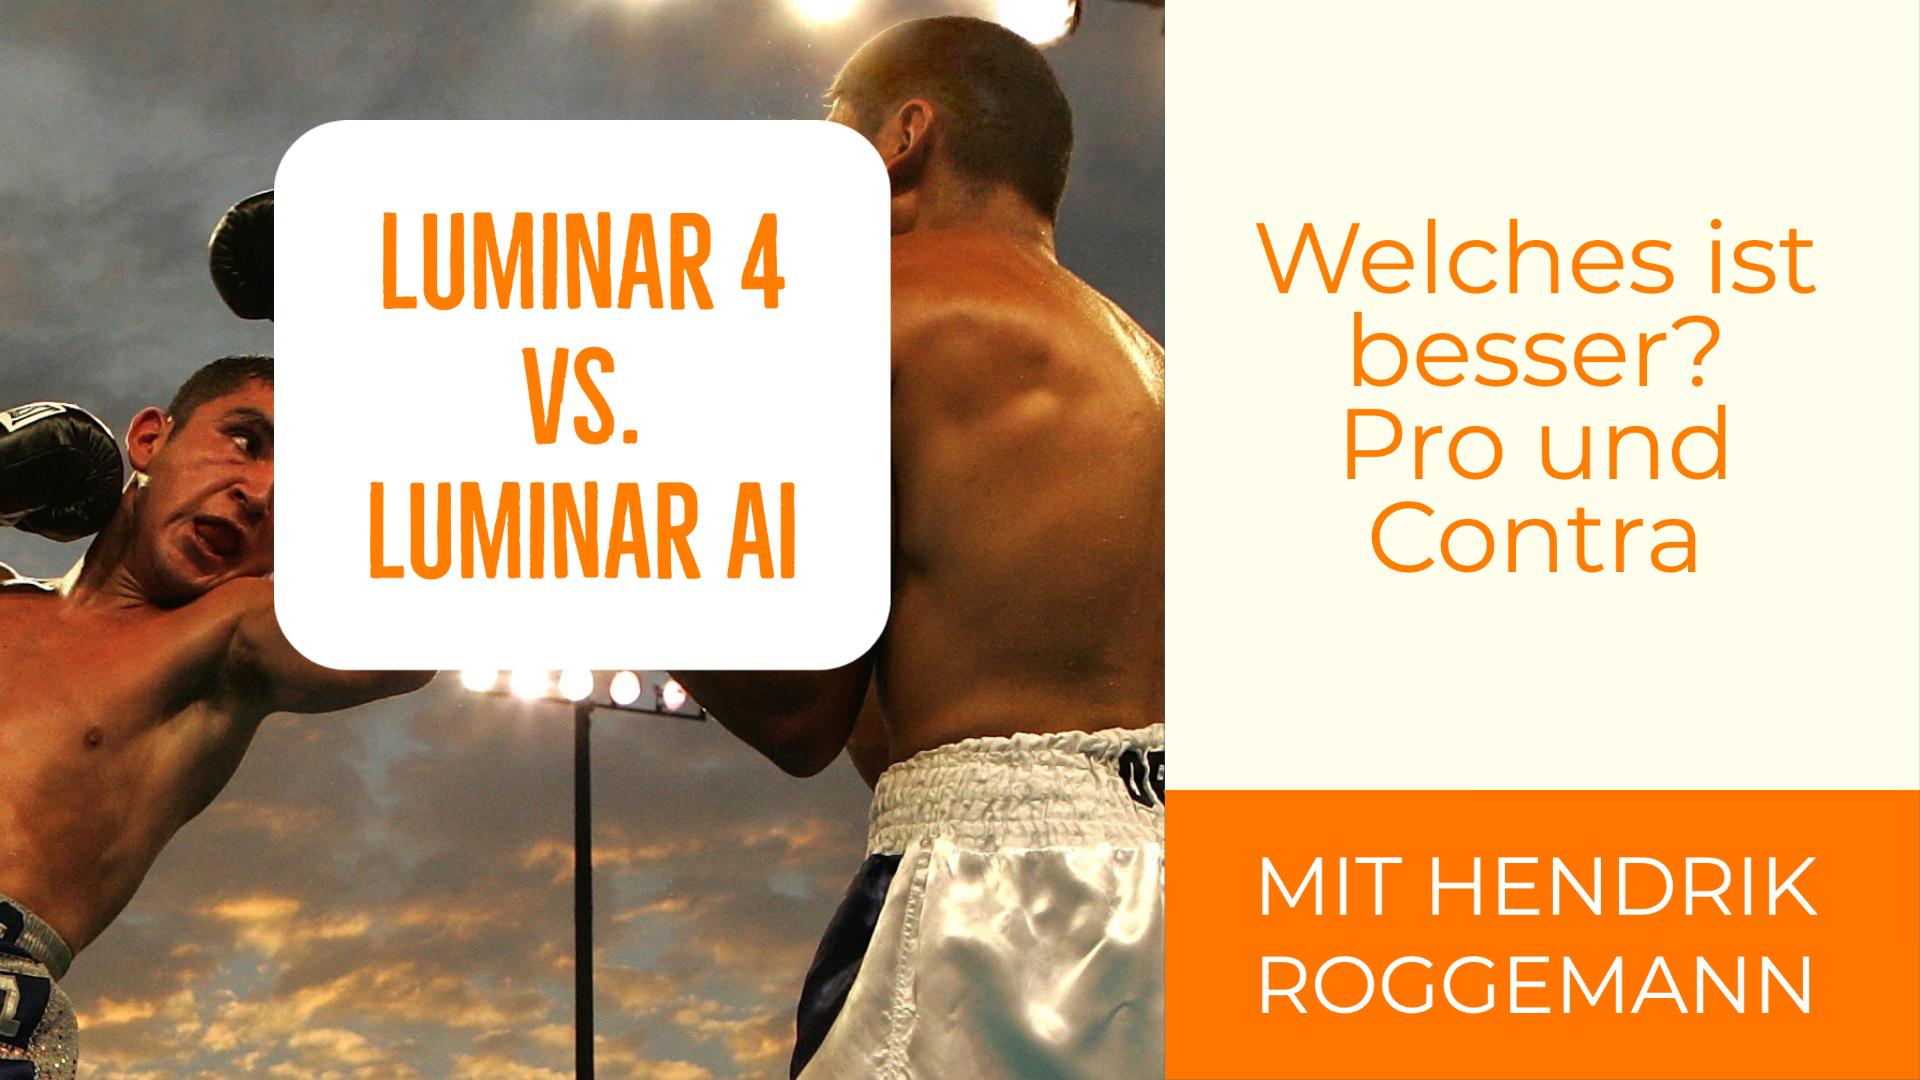 Vergleich Luminar 4 oder Luminar AI